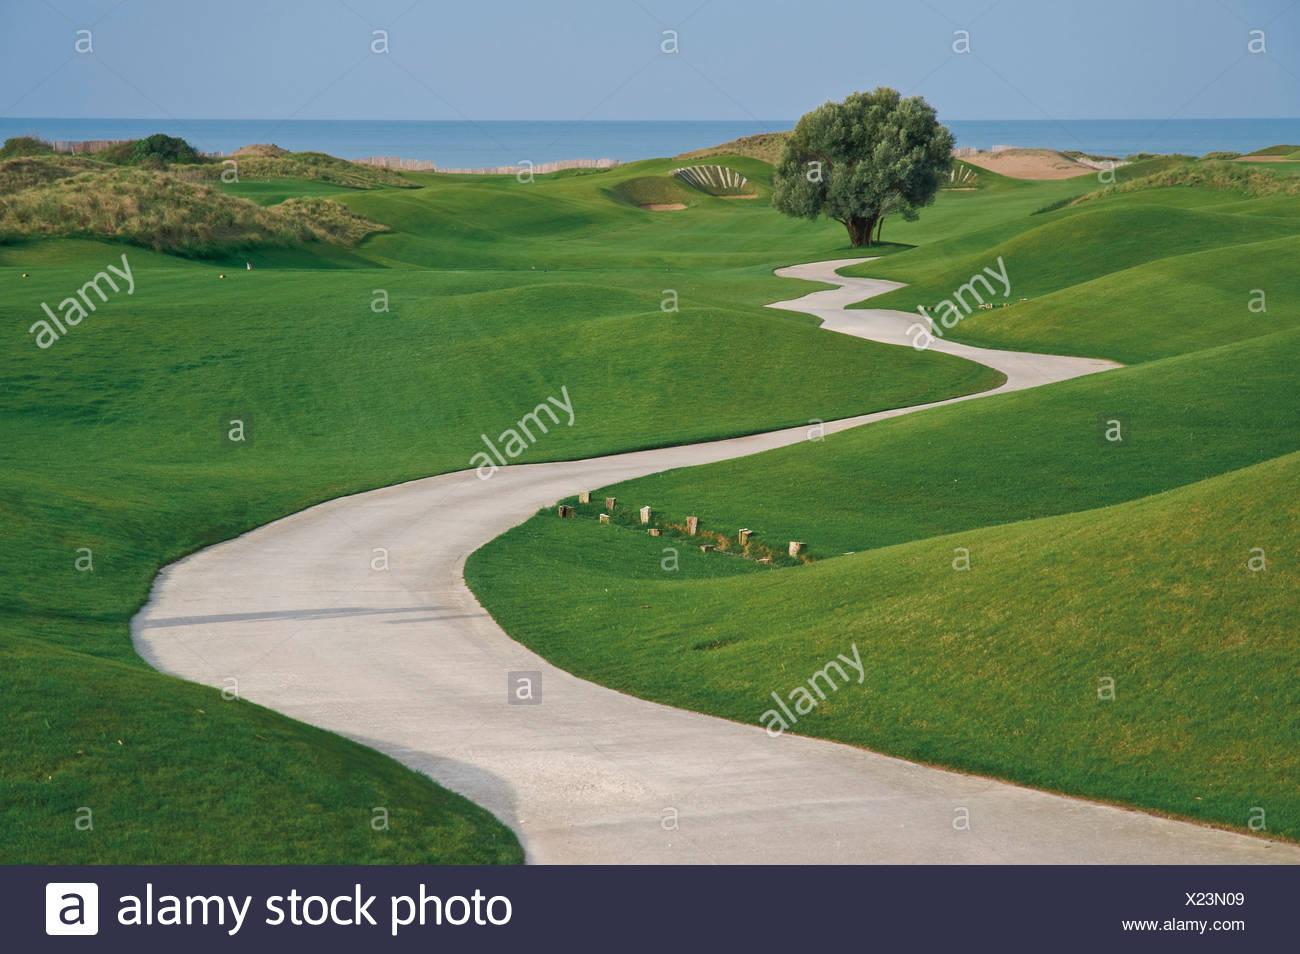 Turkey, Antalya, View of pathway passing through grass - Stock Image